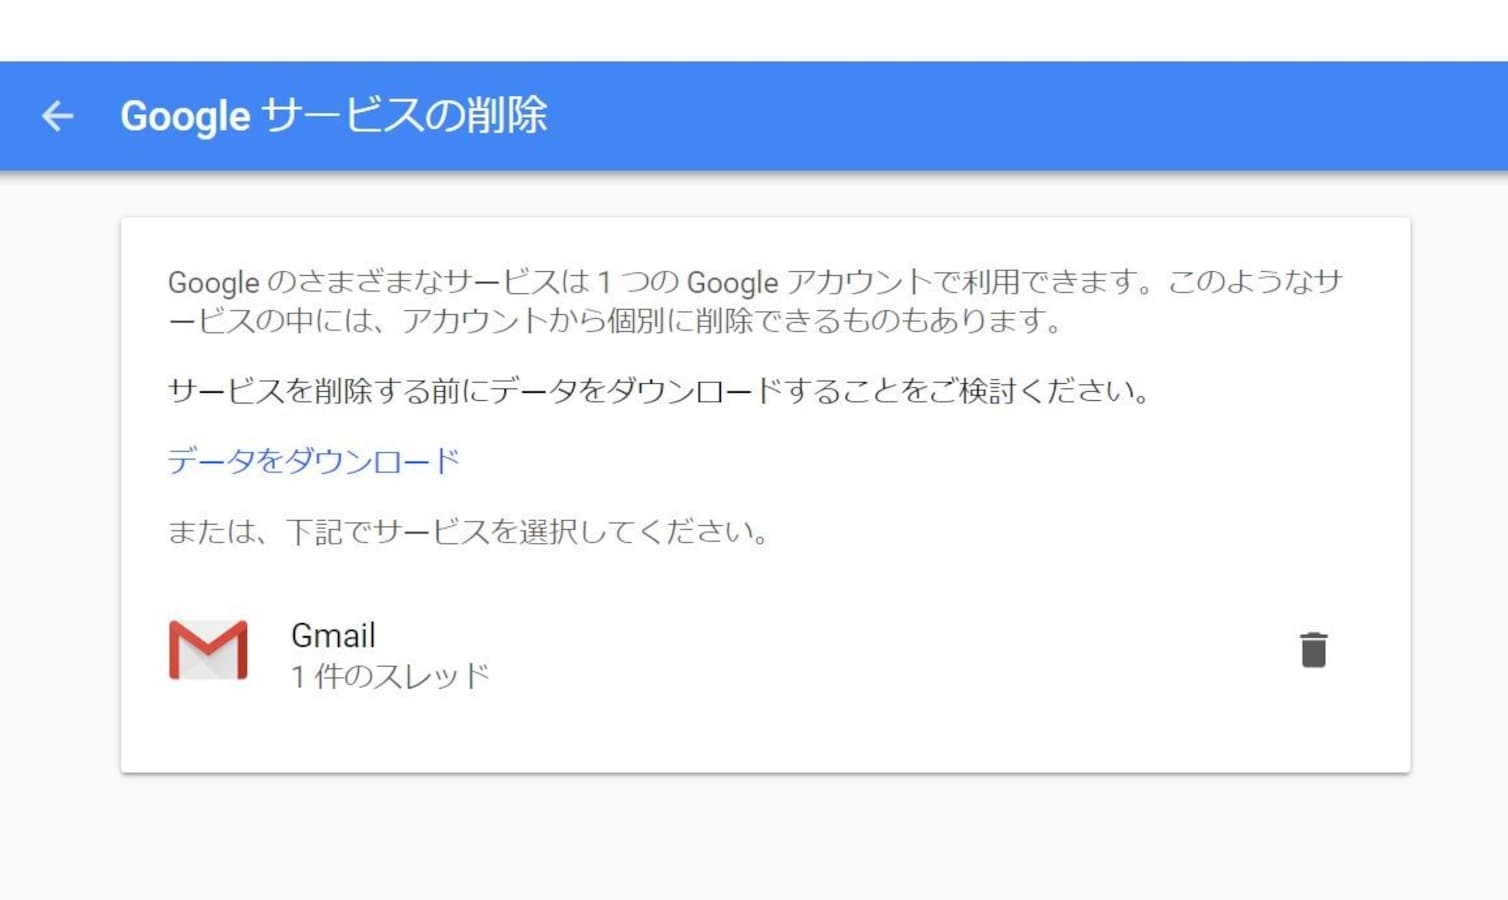 Gmailのアカウントを完全に削除する方法と注意点 Gmailの使い方 All About